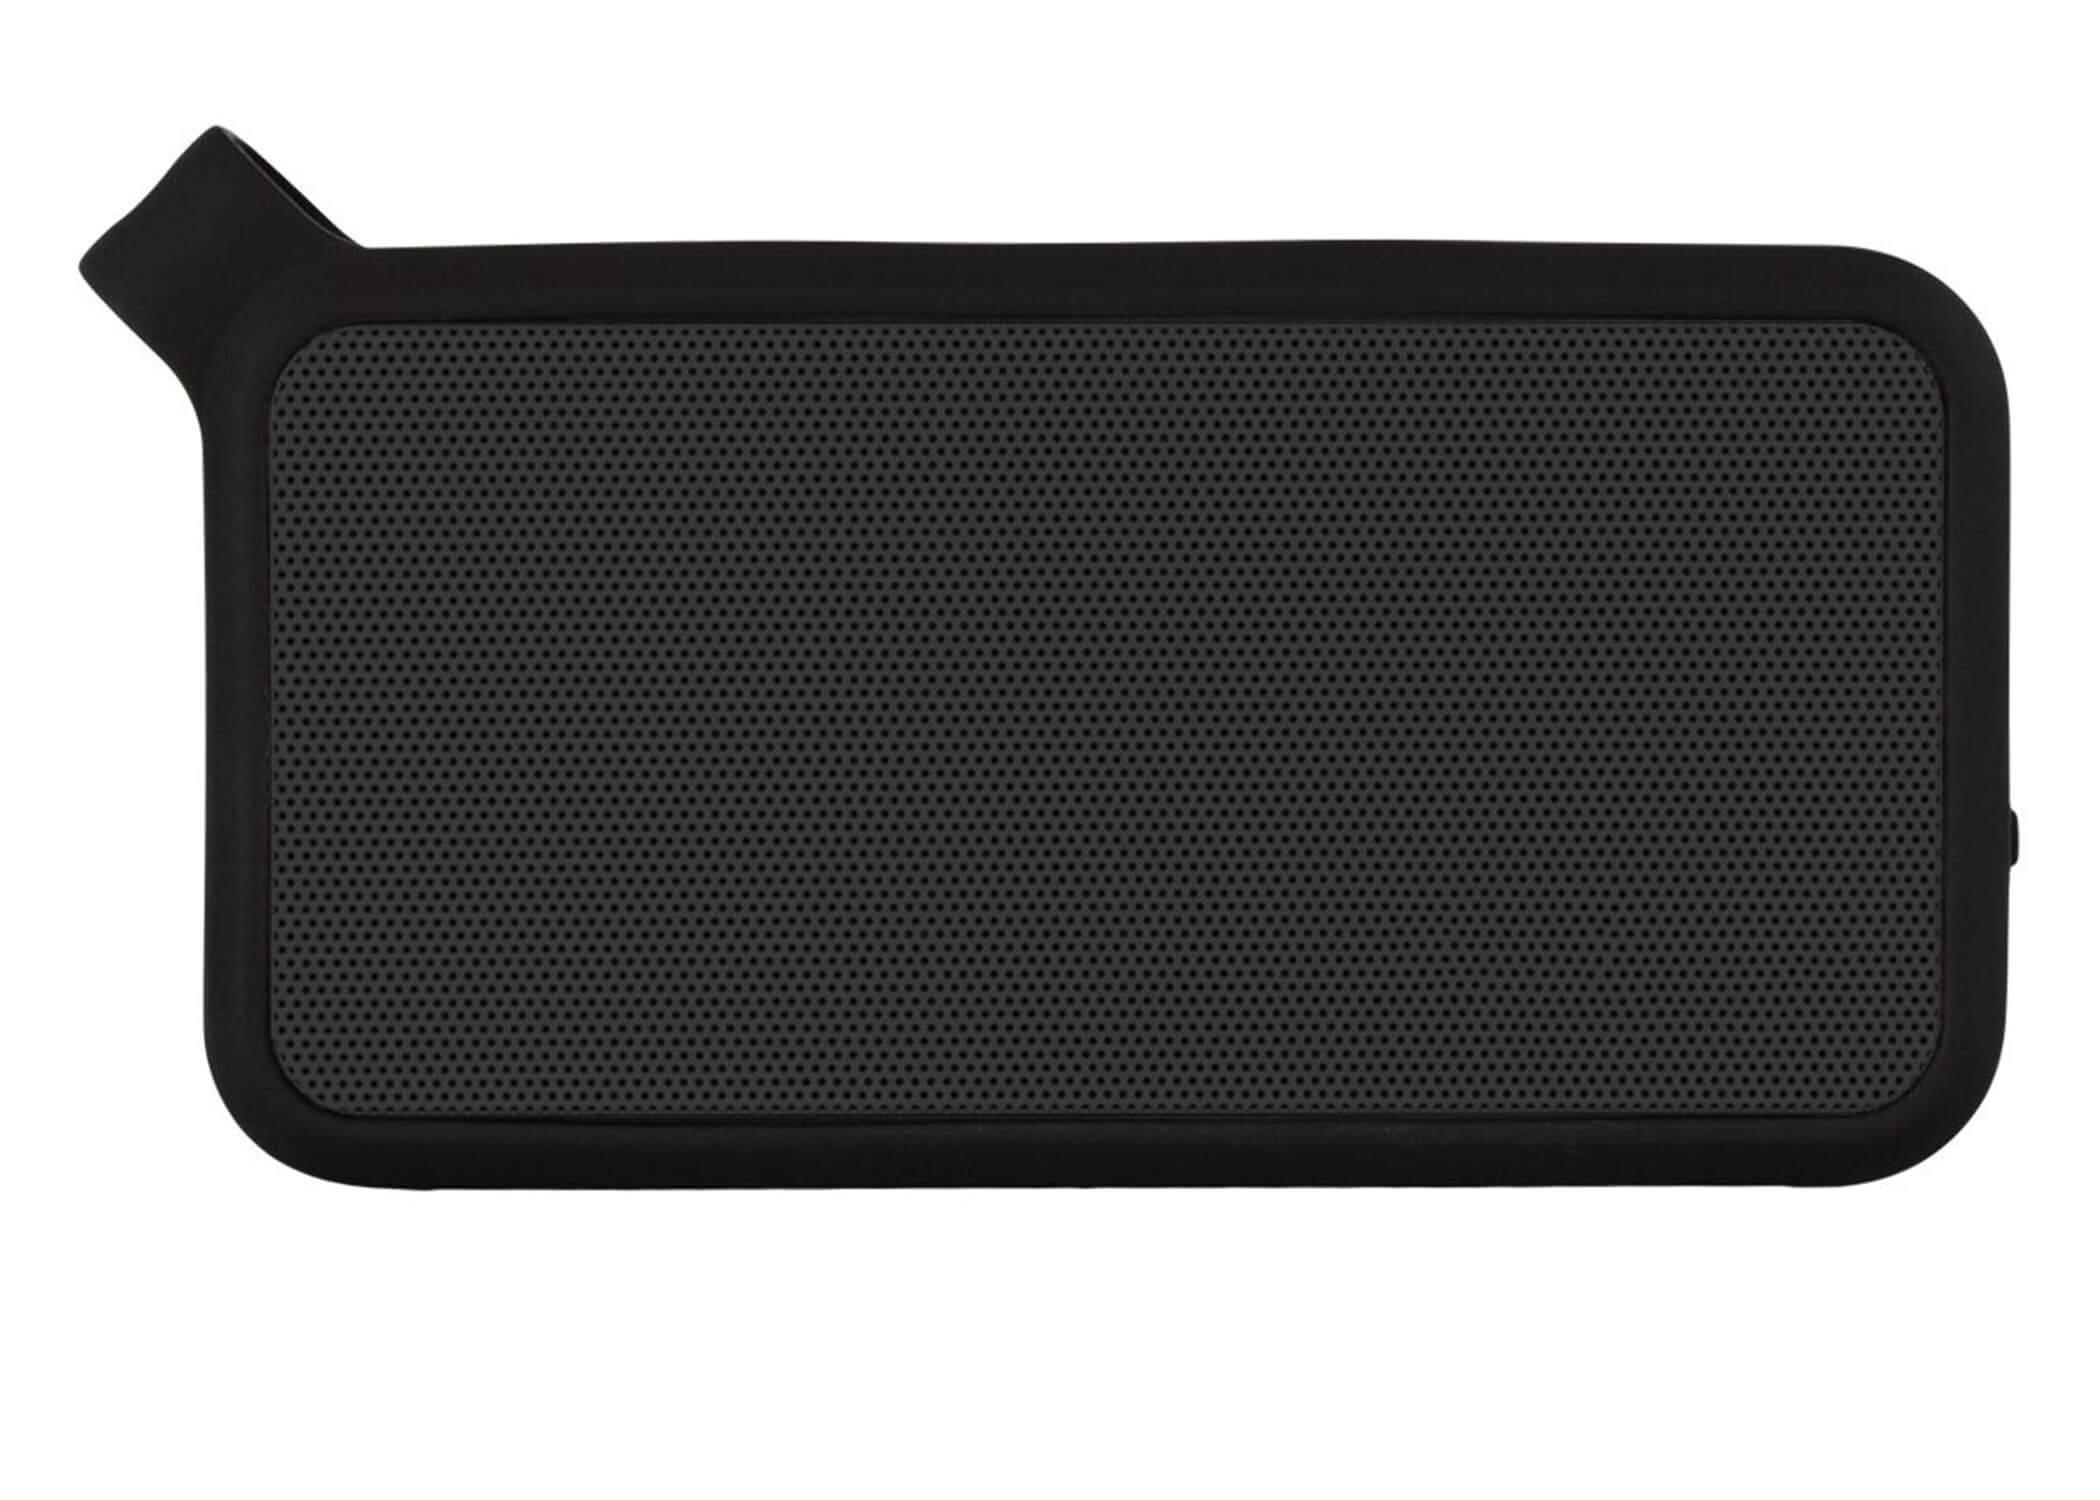 pump-it-up-bluetooth-speaker